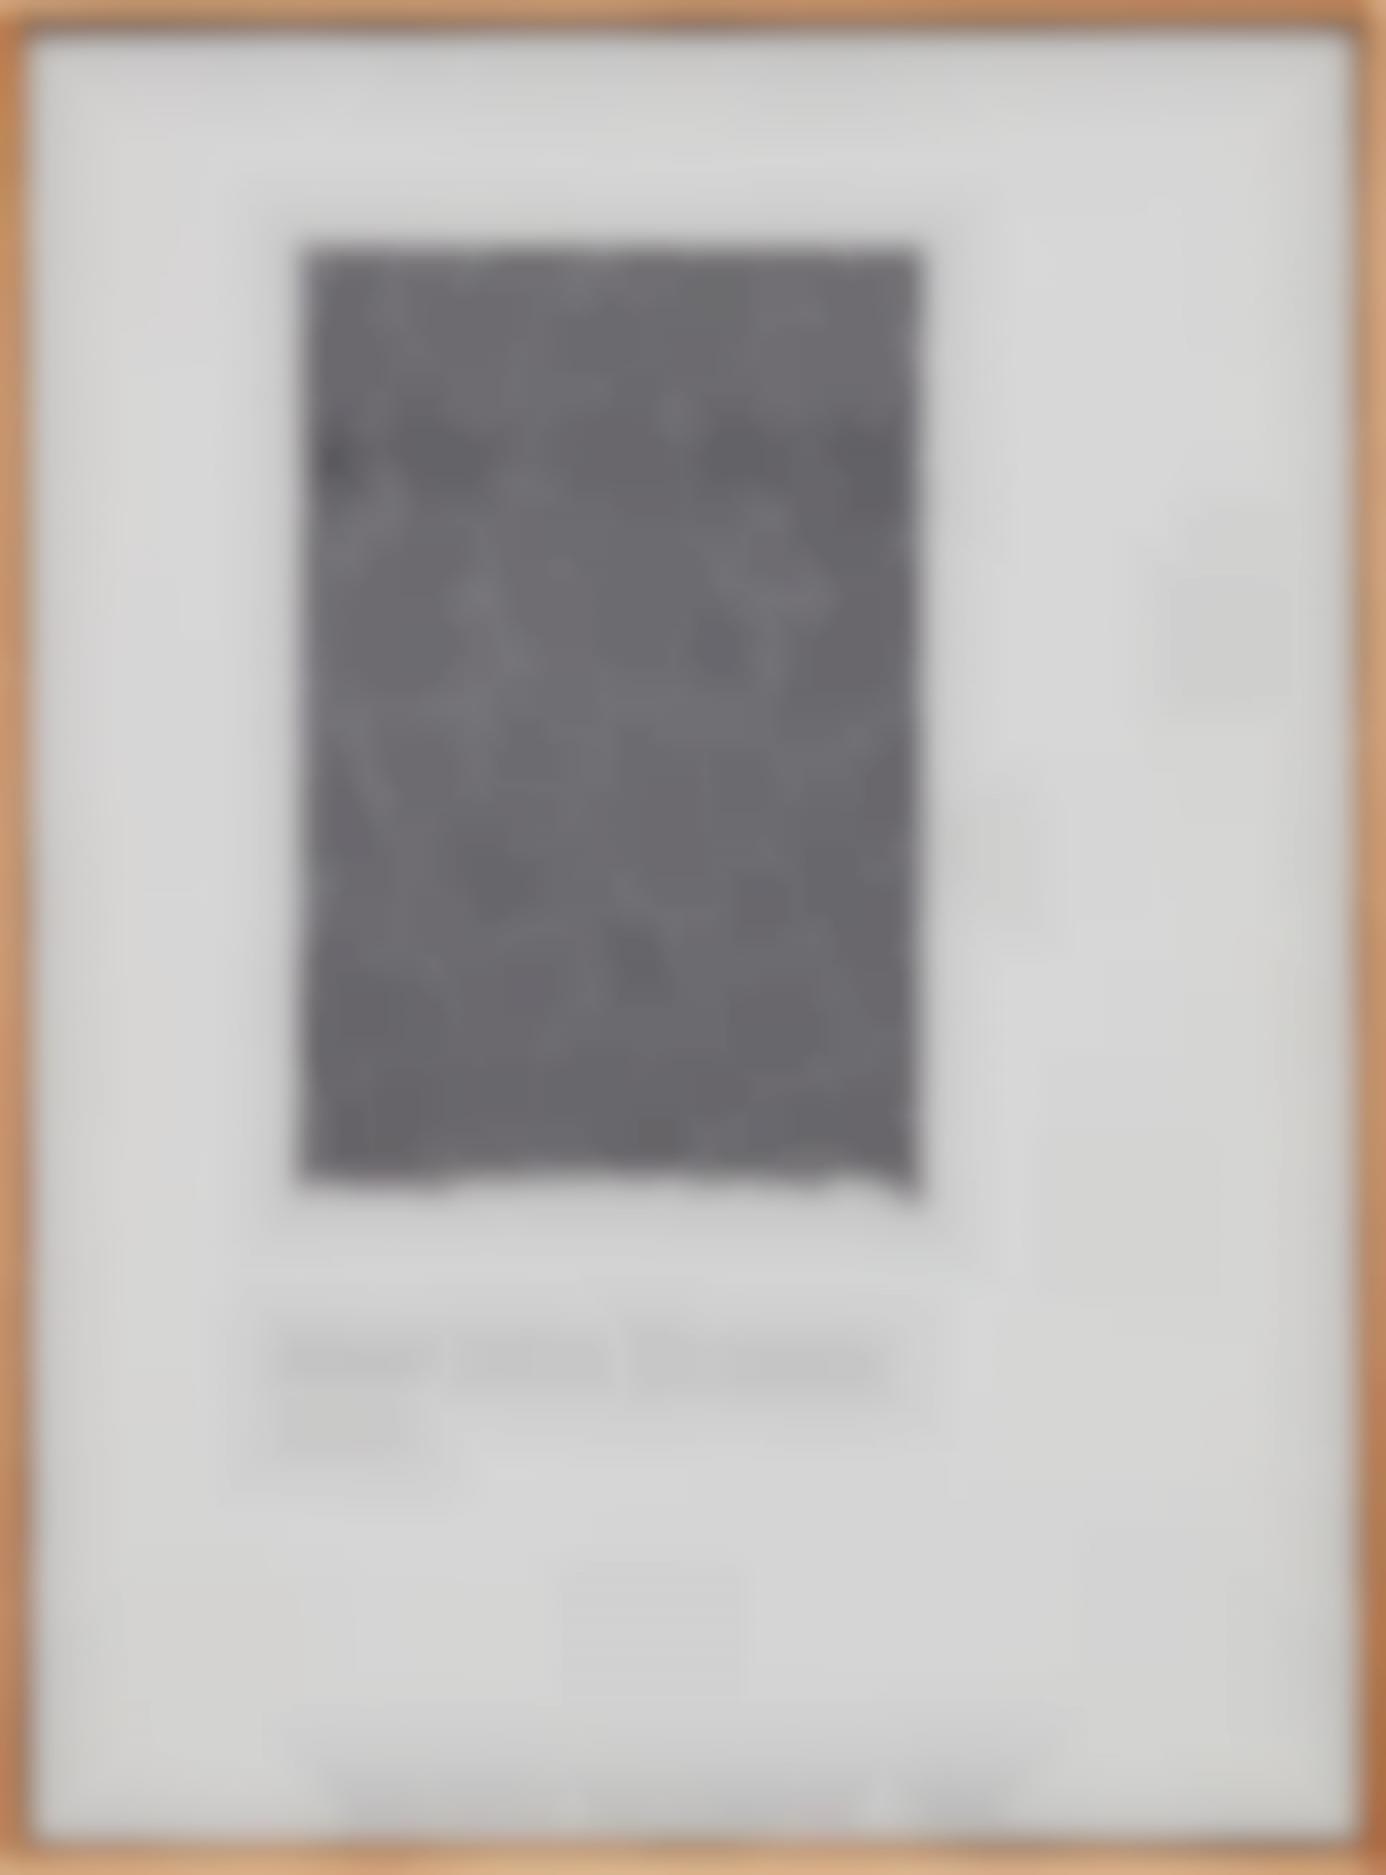 Richard Pettibone-Jasper Johns, 'Tennyson'-1965